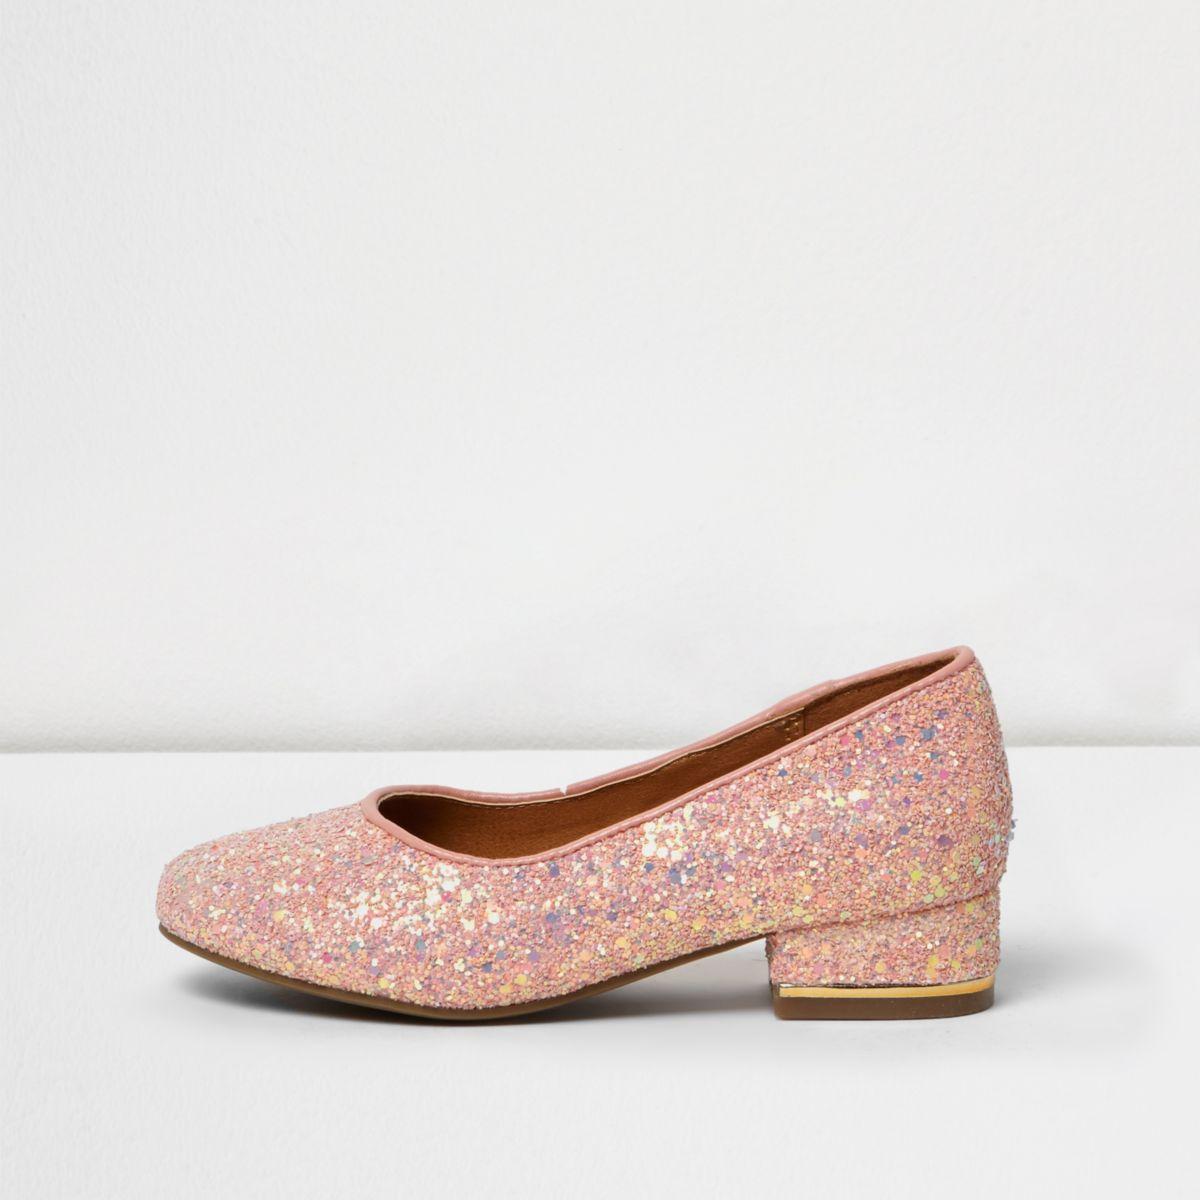 Girls pink glitter court shoes